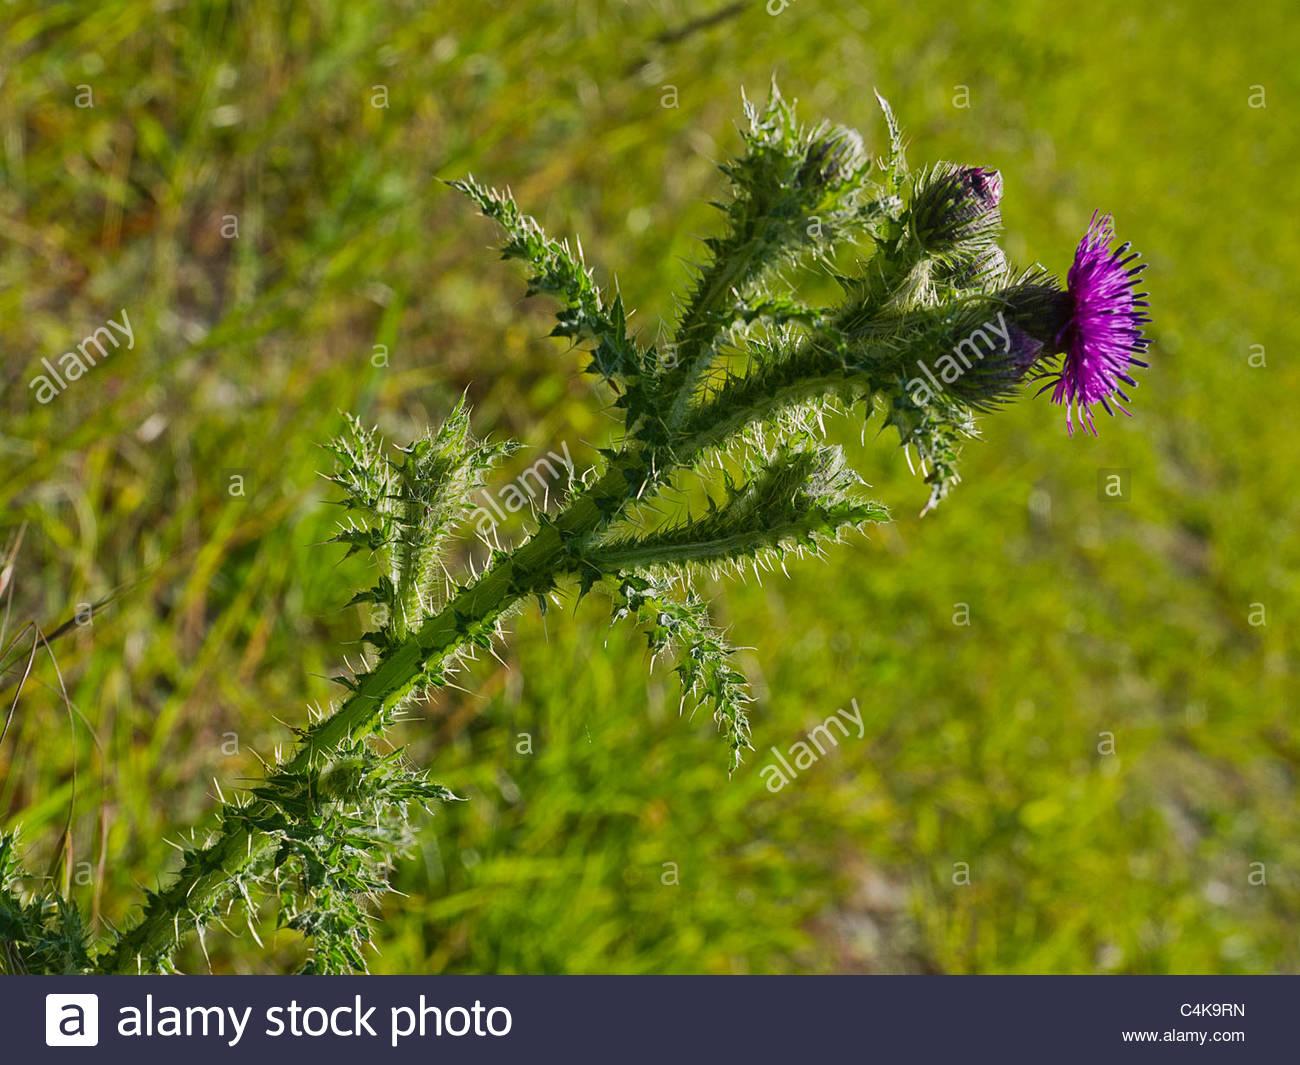 Thistle Wild Plant Asteraceae. - Stock Image